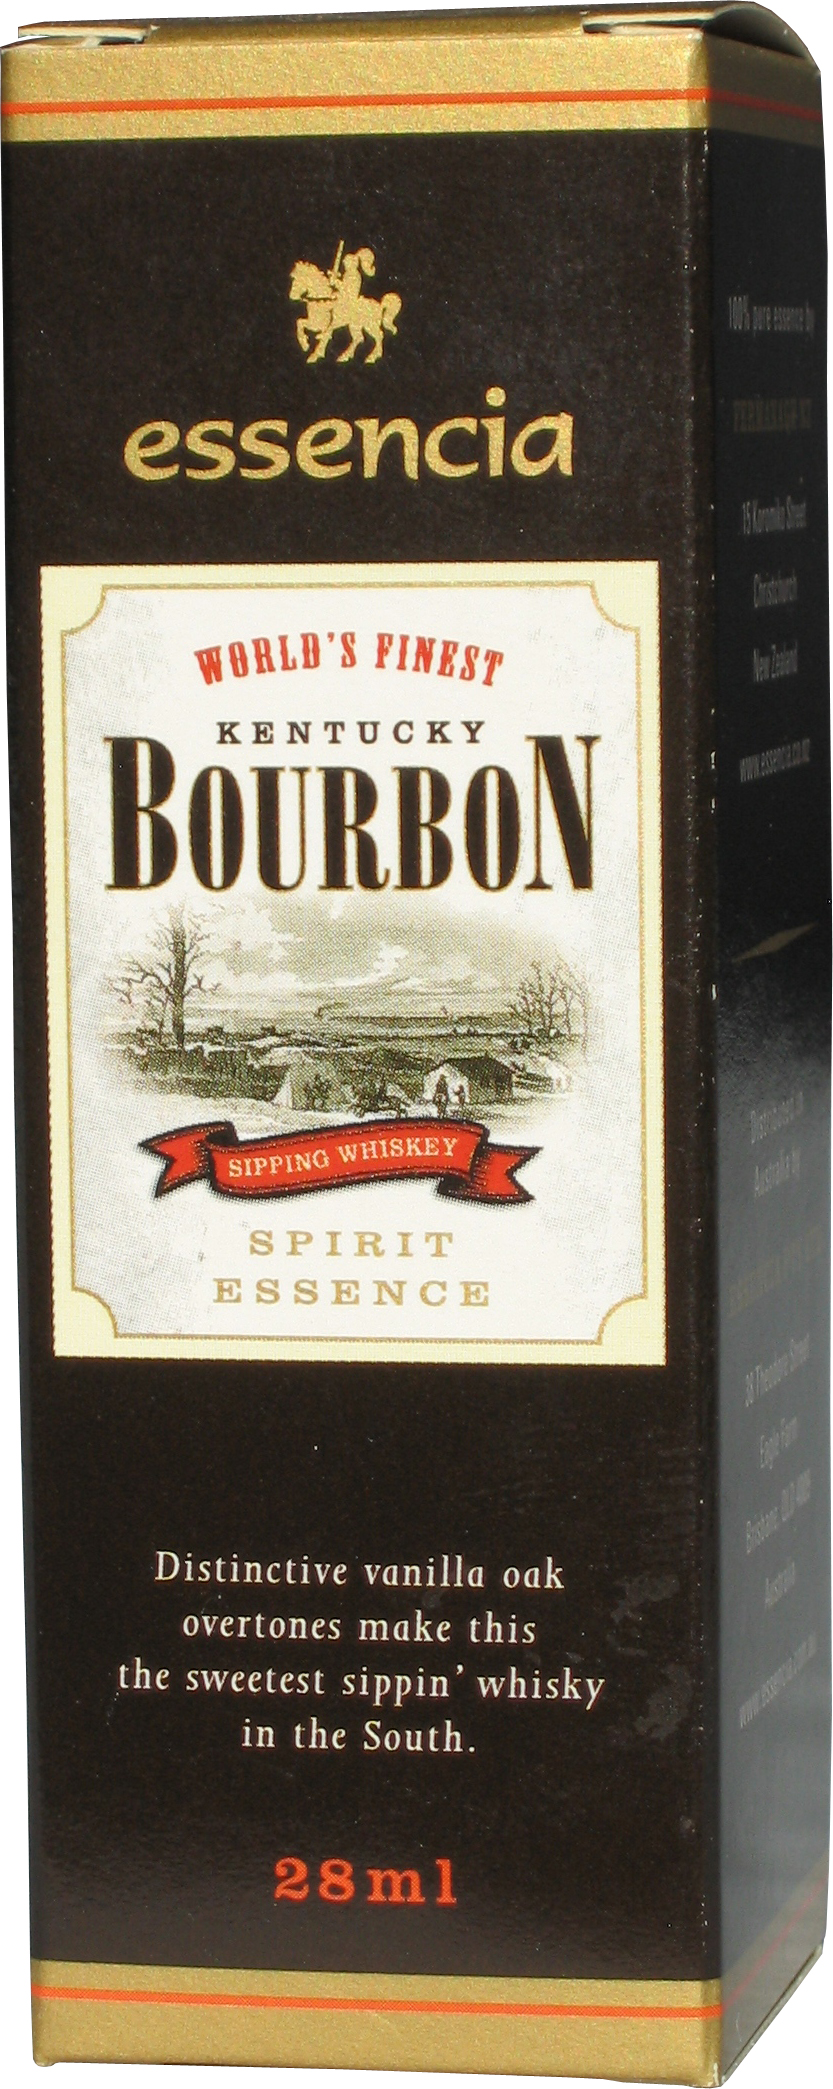 Essencia Kentuky Bourbon